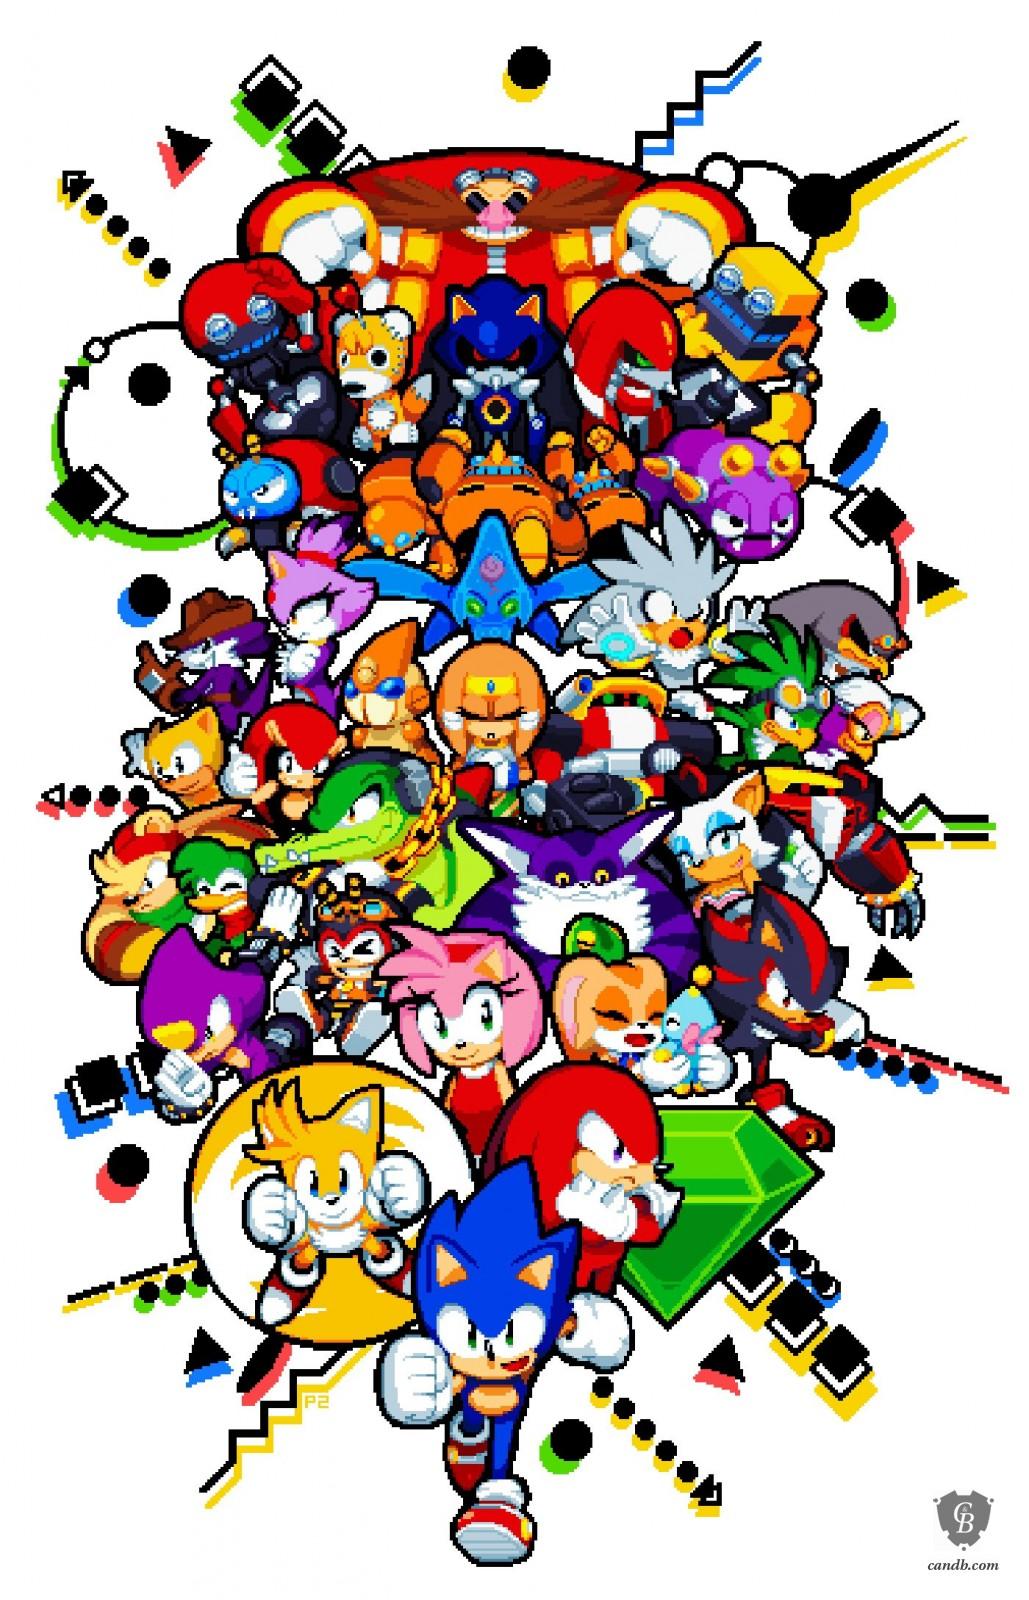 Drawn pixel art classic Hedgehog print the the Hedgehog